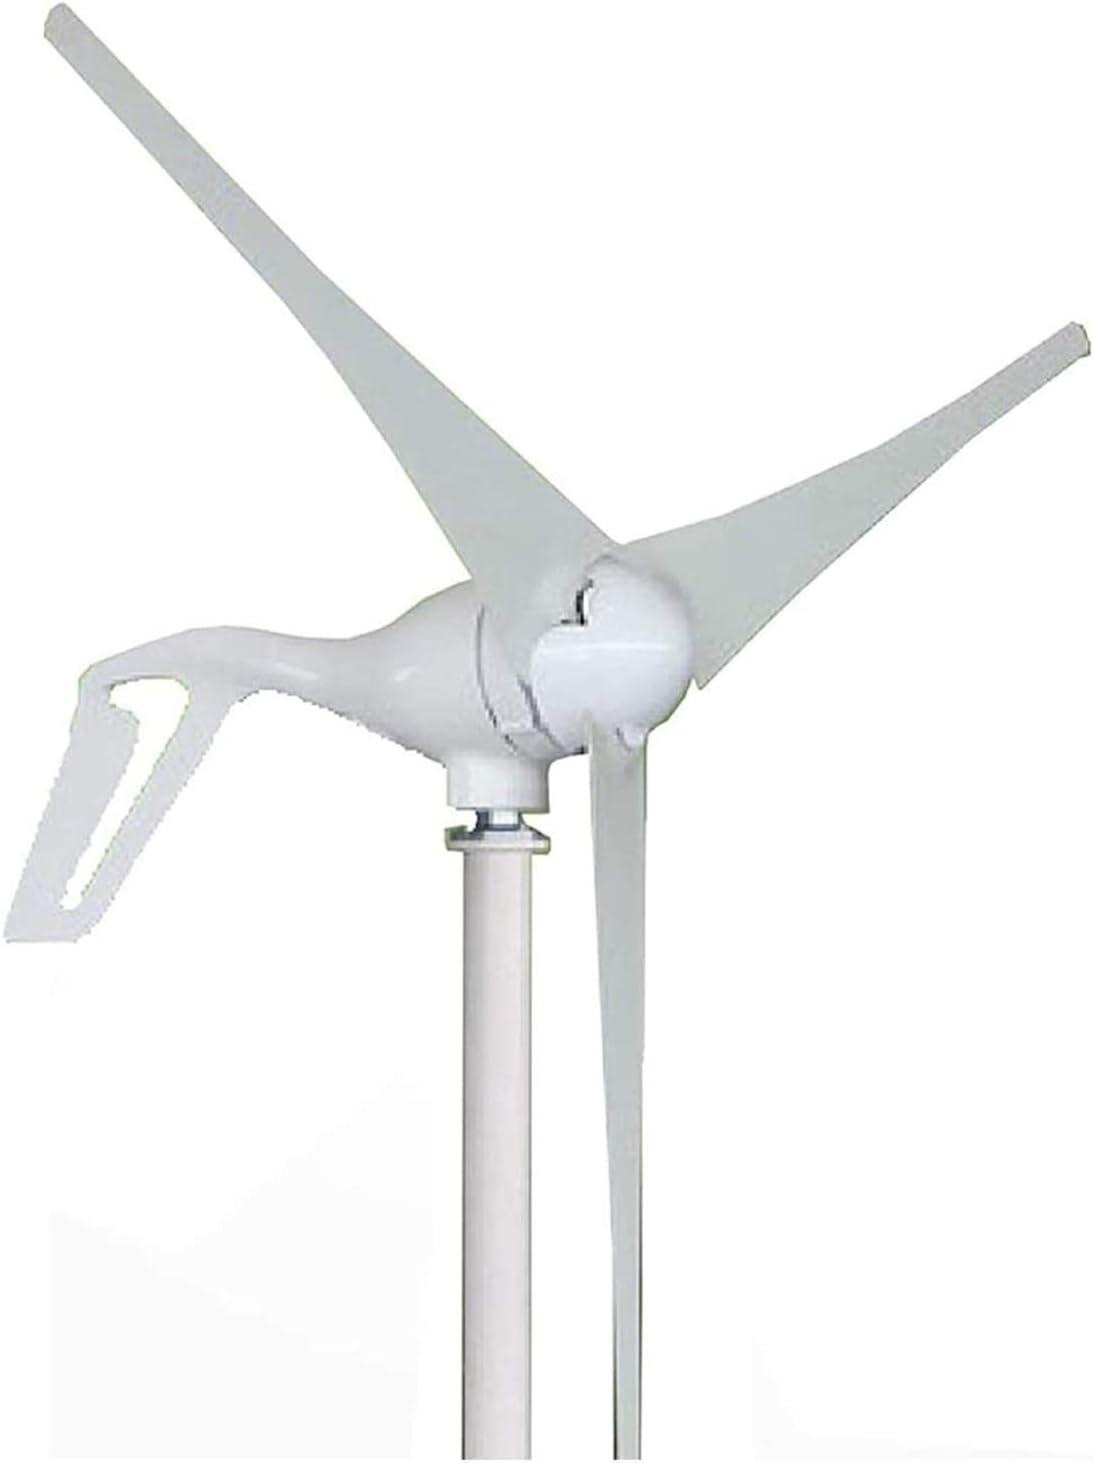 LXLH Aerogeneradores, Dyna-Living Aerogenerador 300W / 400W / 500W / 600W / 700W / 800W DC 12V / 24V Negocios 3 aspas con Controlador para Casas Marinas RV Energía Industrial, 800w